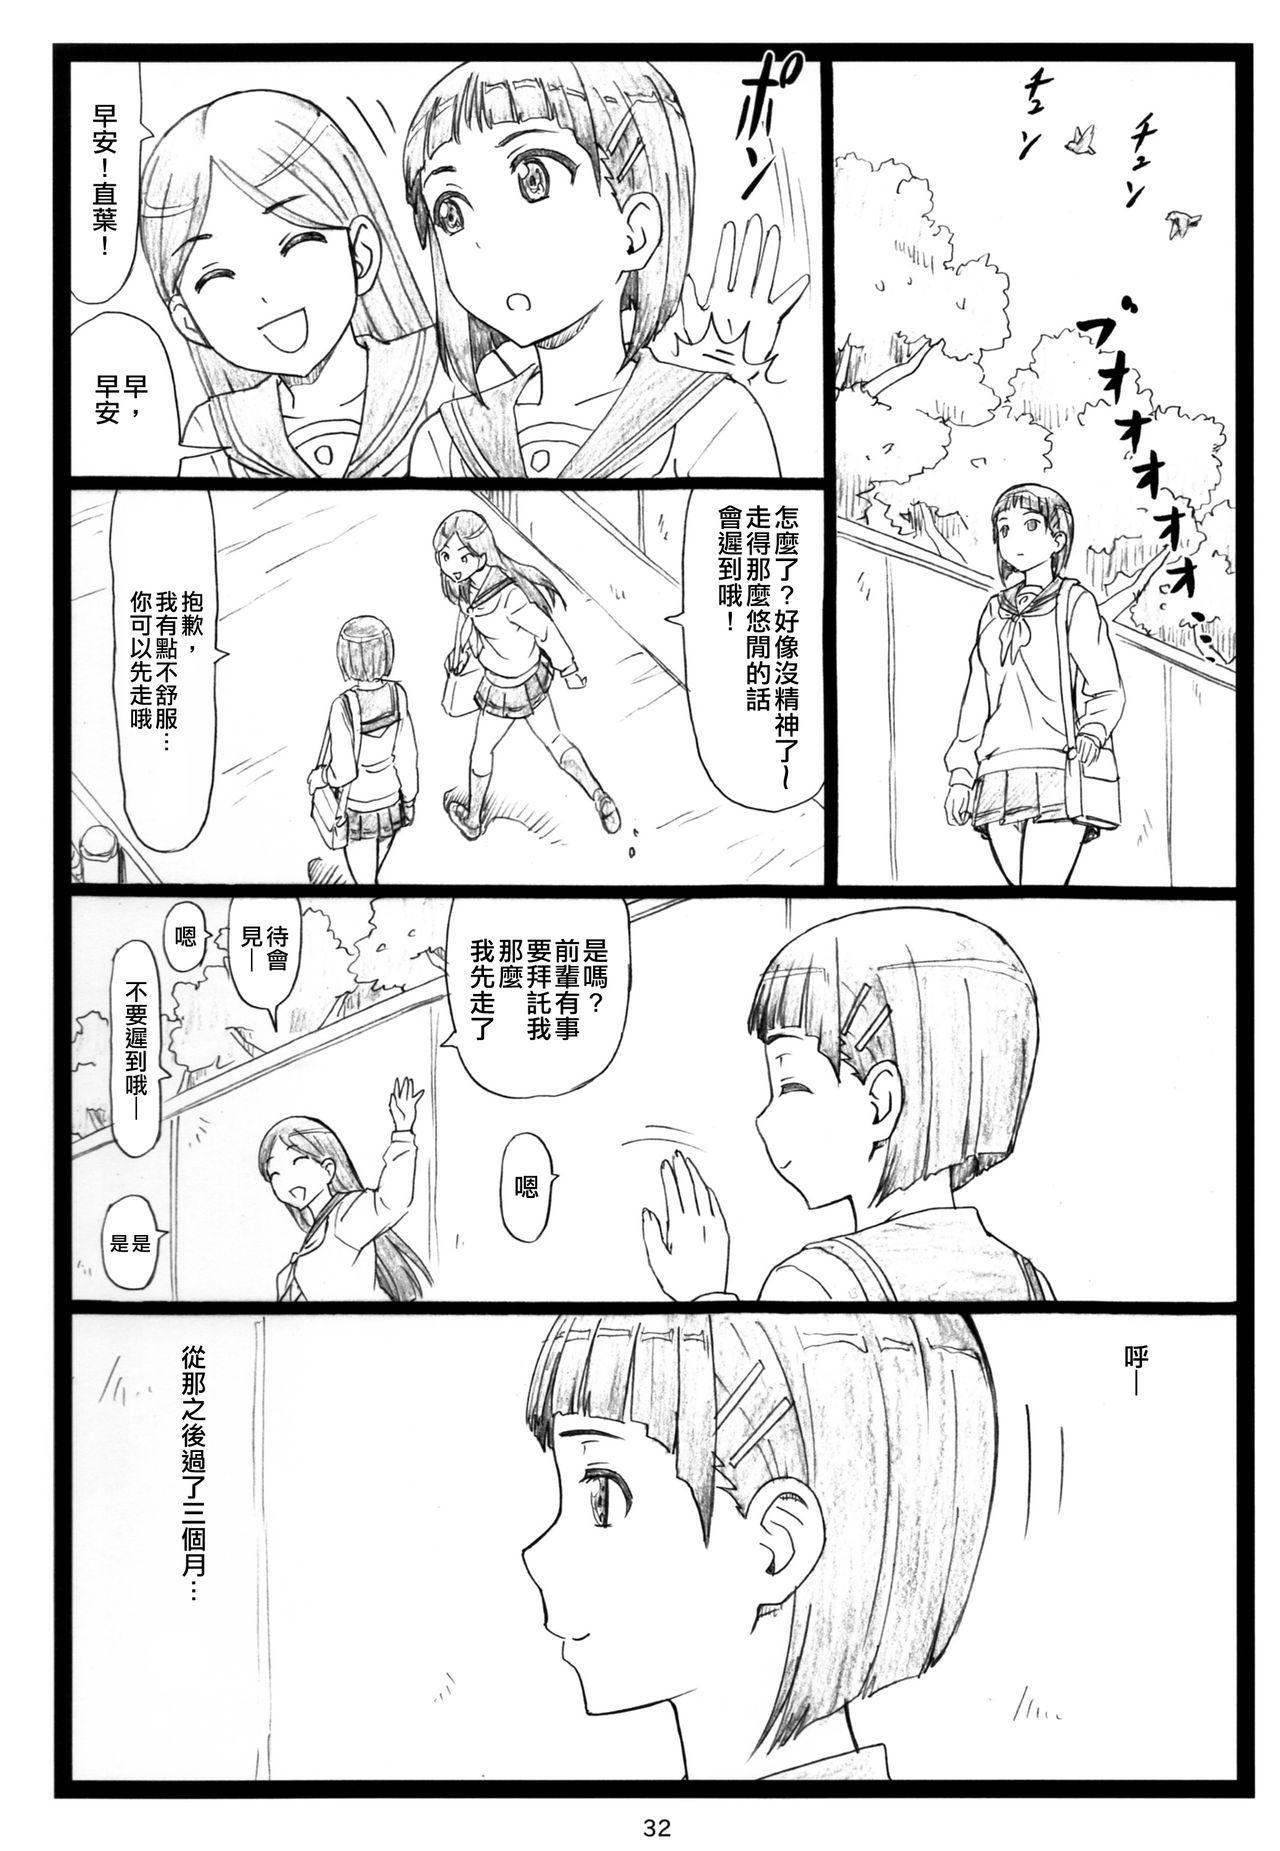 Kuzuha 31